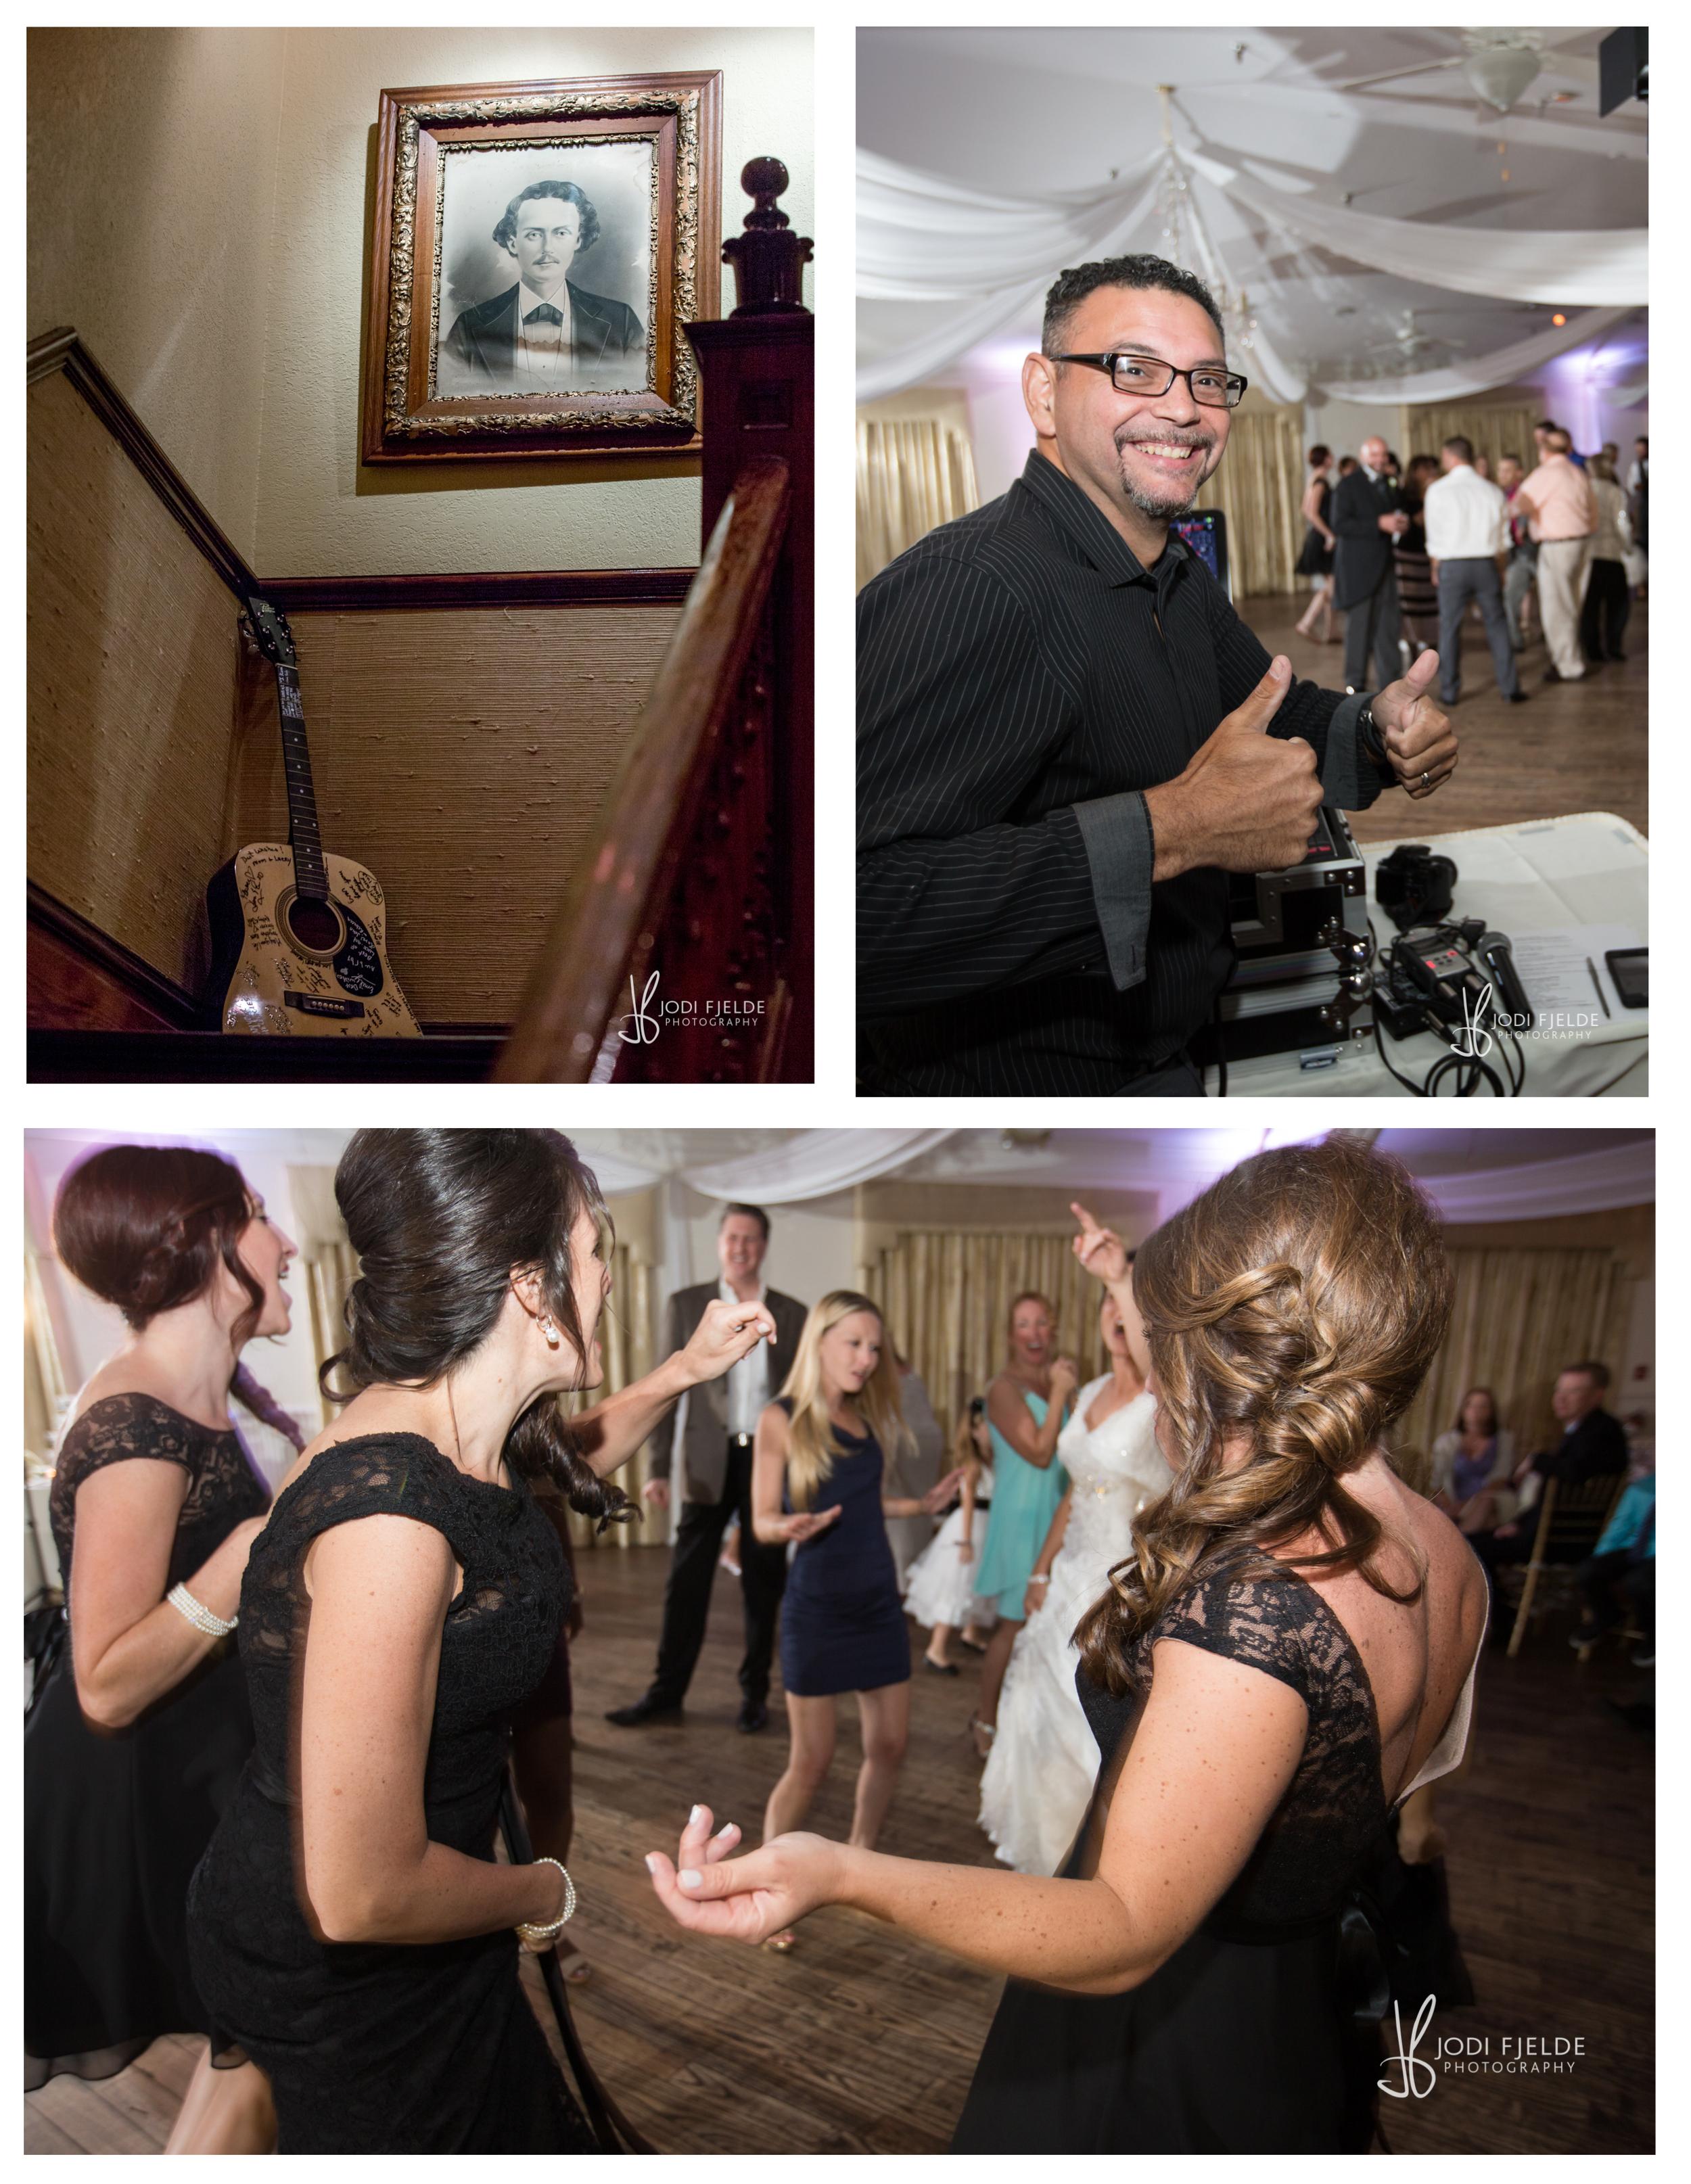 Highland_Manor_Apopka_Florida_wedding_Jackie_&_Tim_photography_jodi_Fjelde_photography-32.jpg